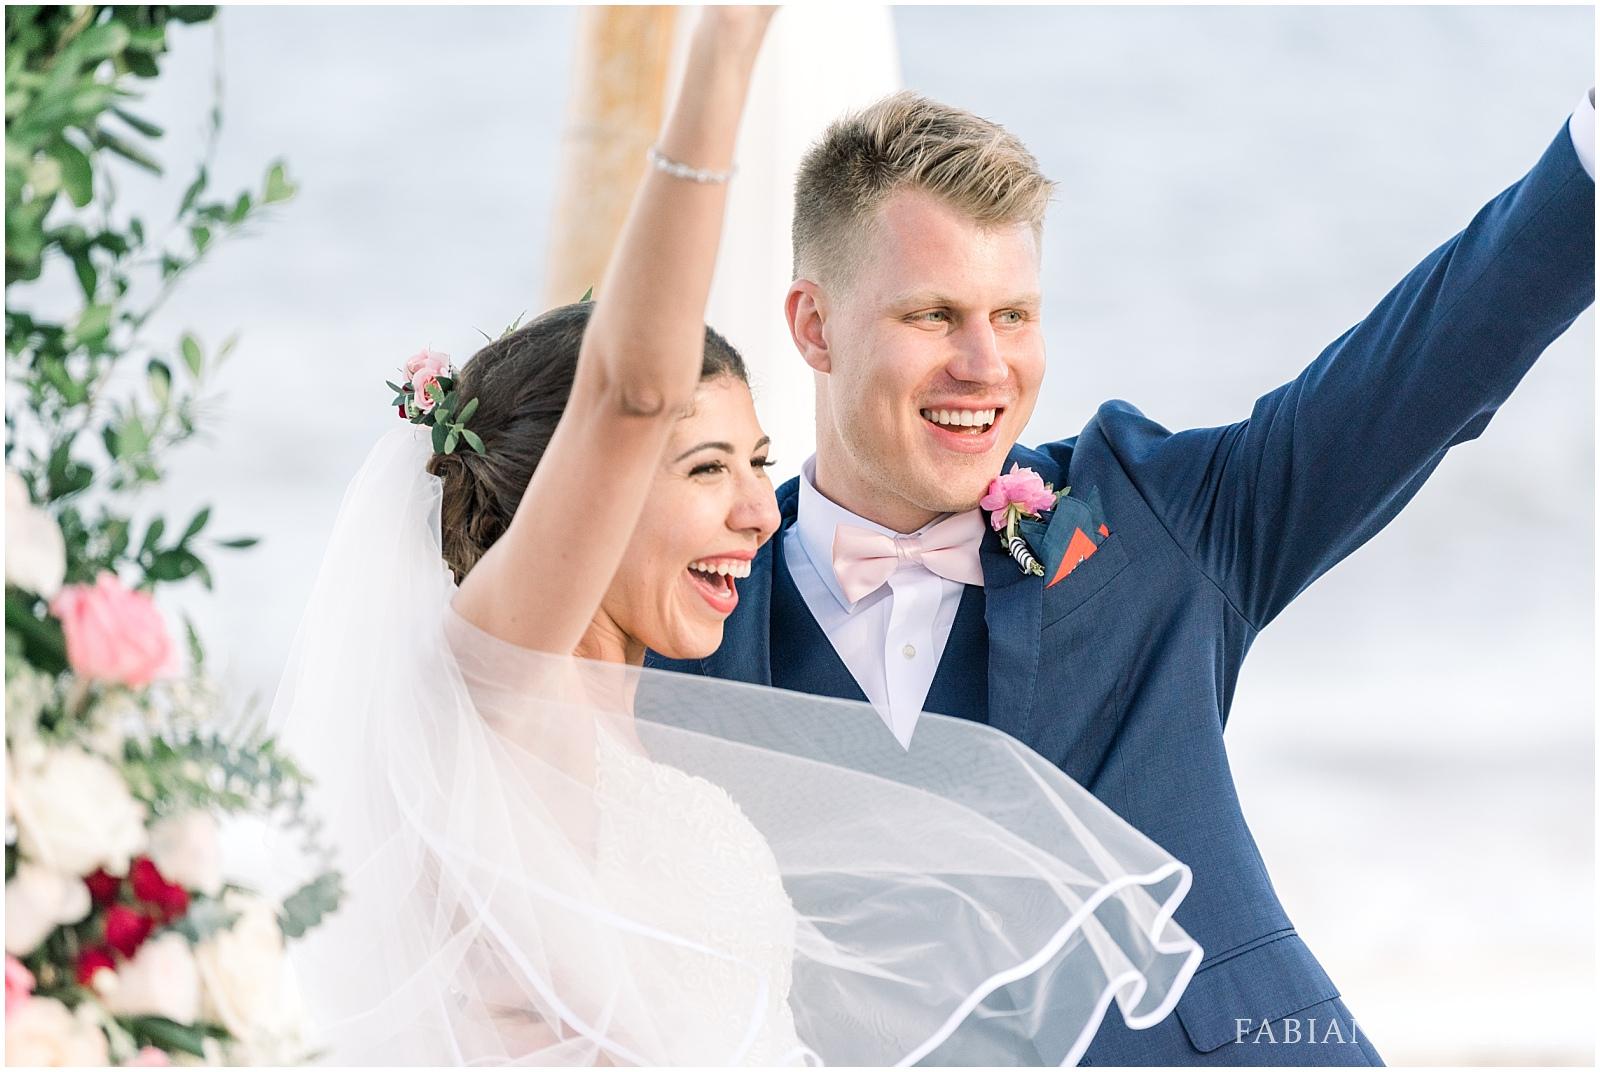 TJ_Now_Sapphire_Riviera_Cancun_Mexico_Wedding_Photos_0239.jpg